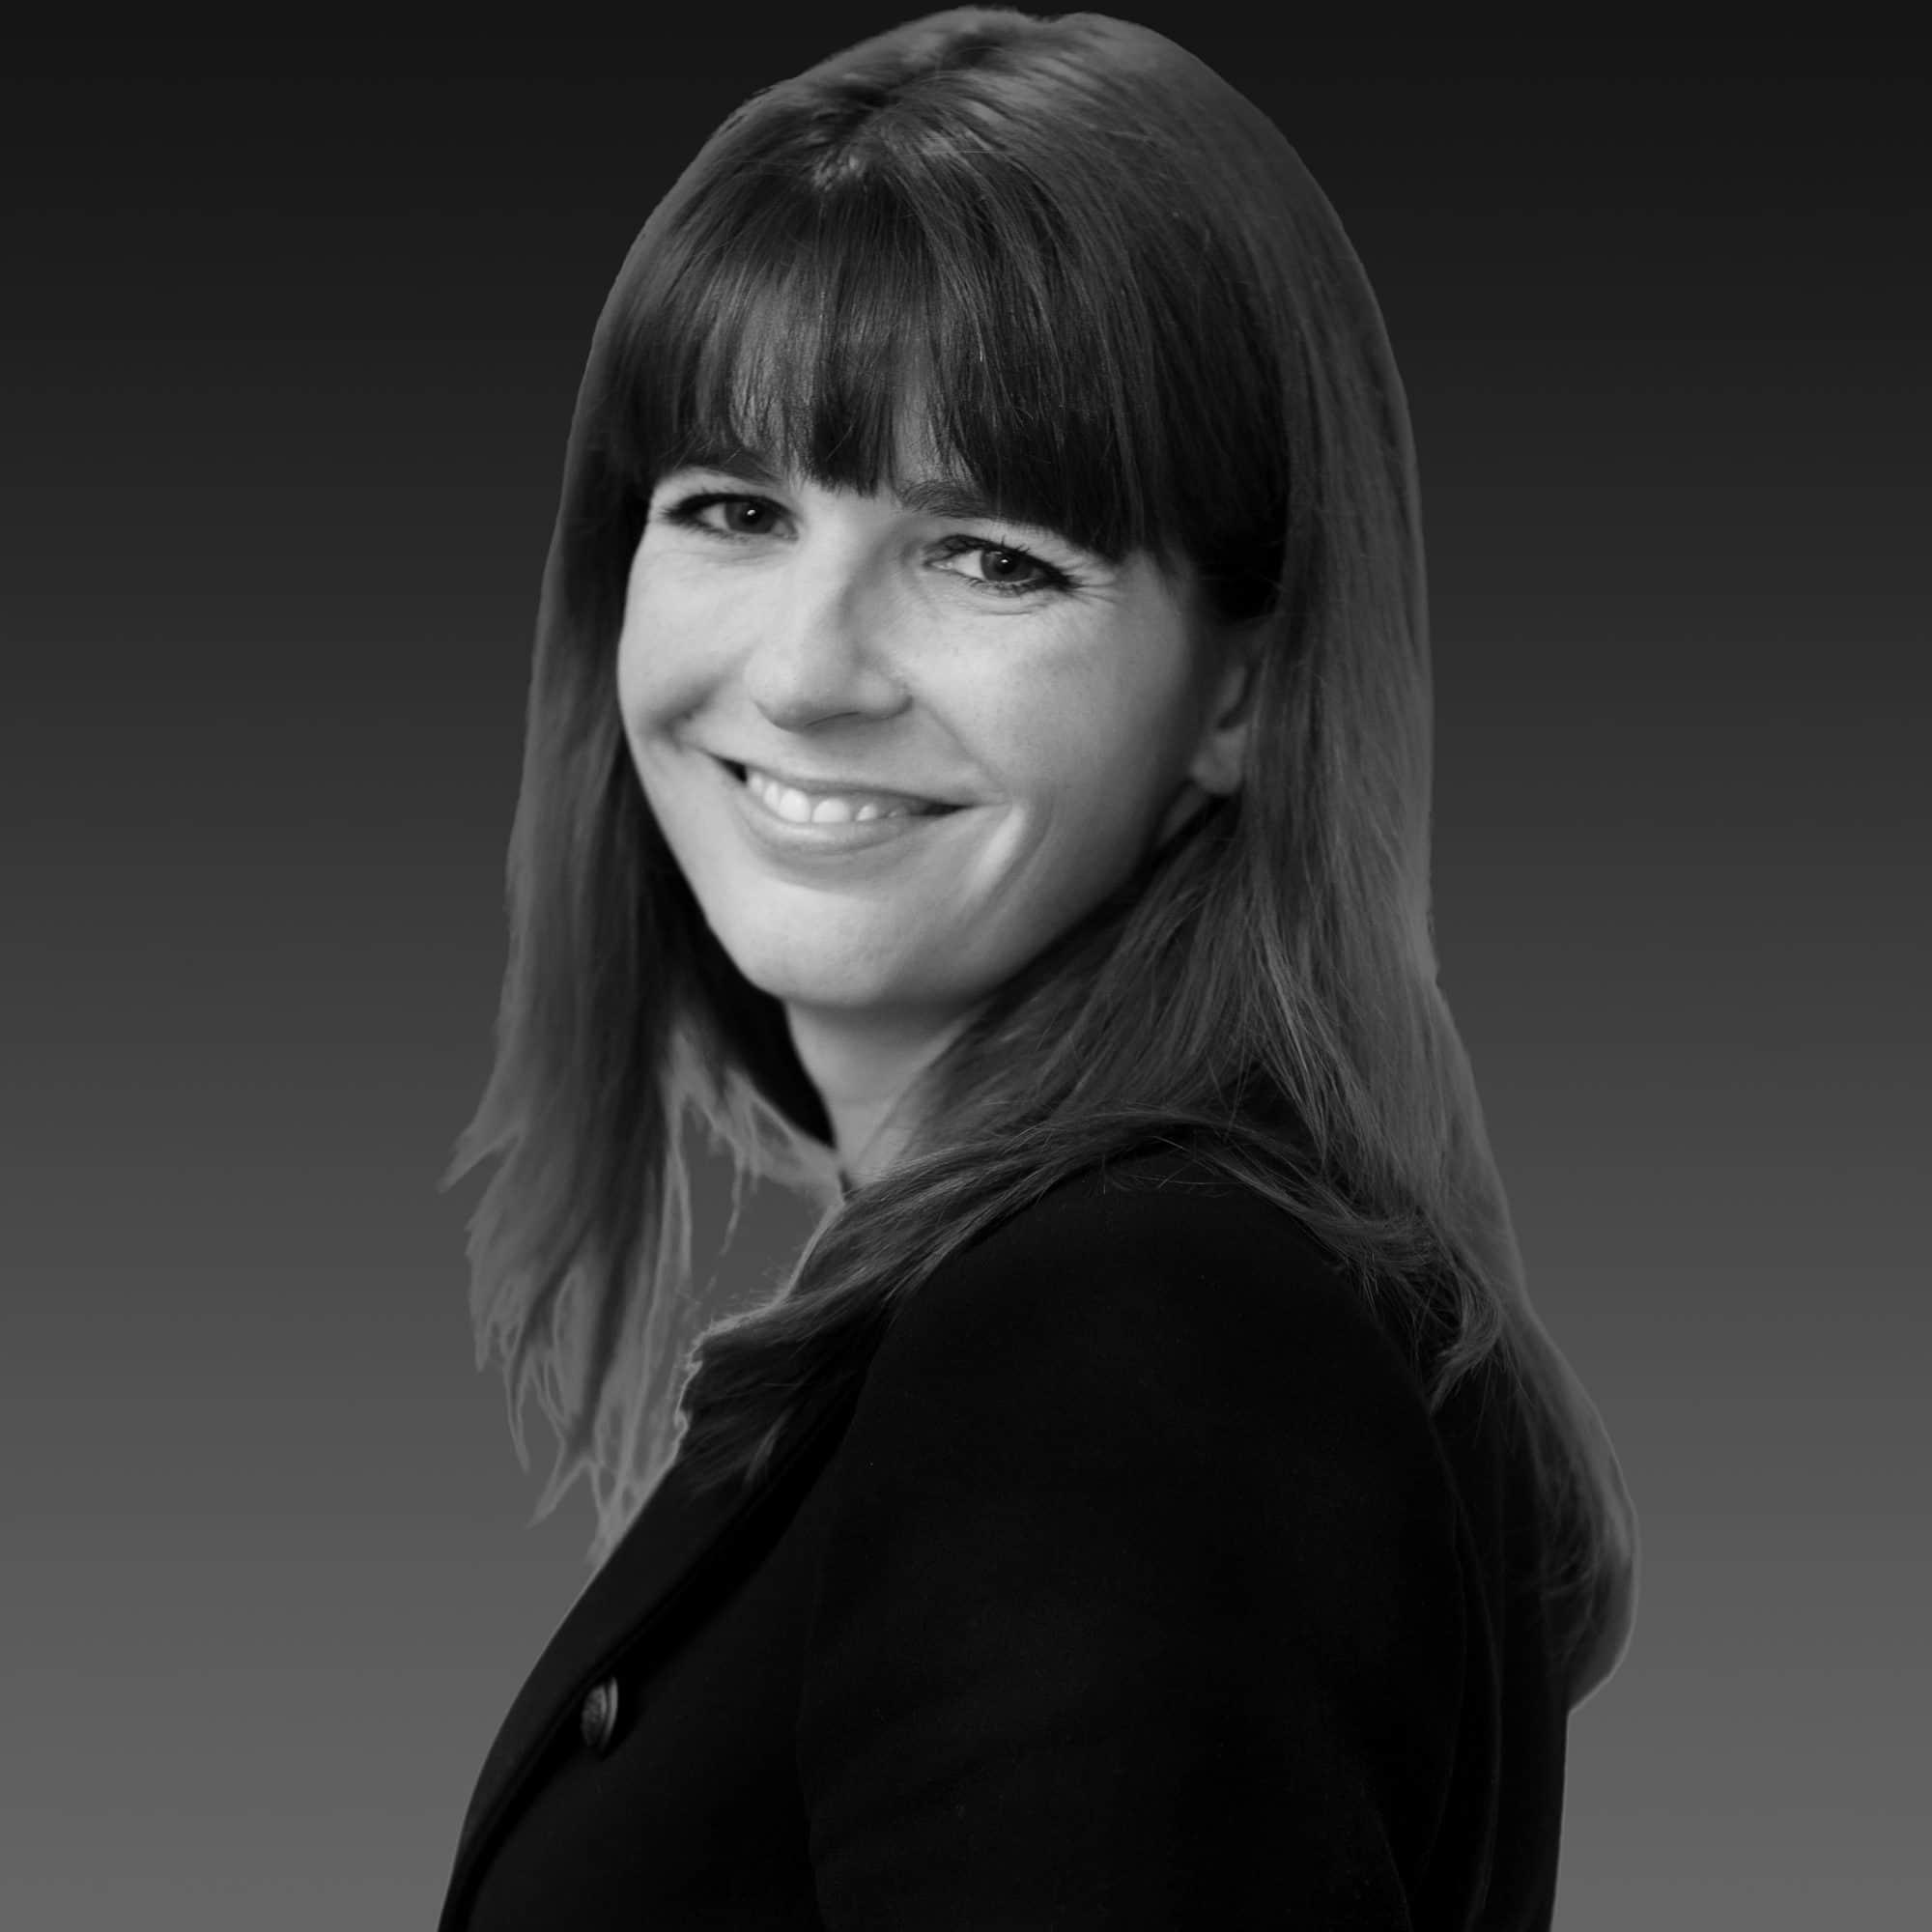 Emilie Pichon, Director of Communications